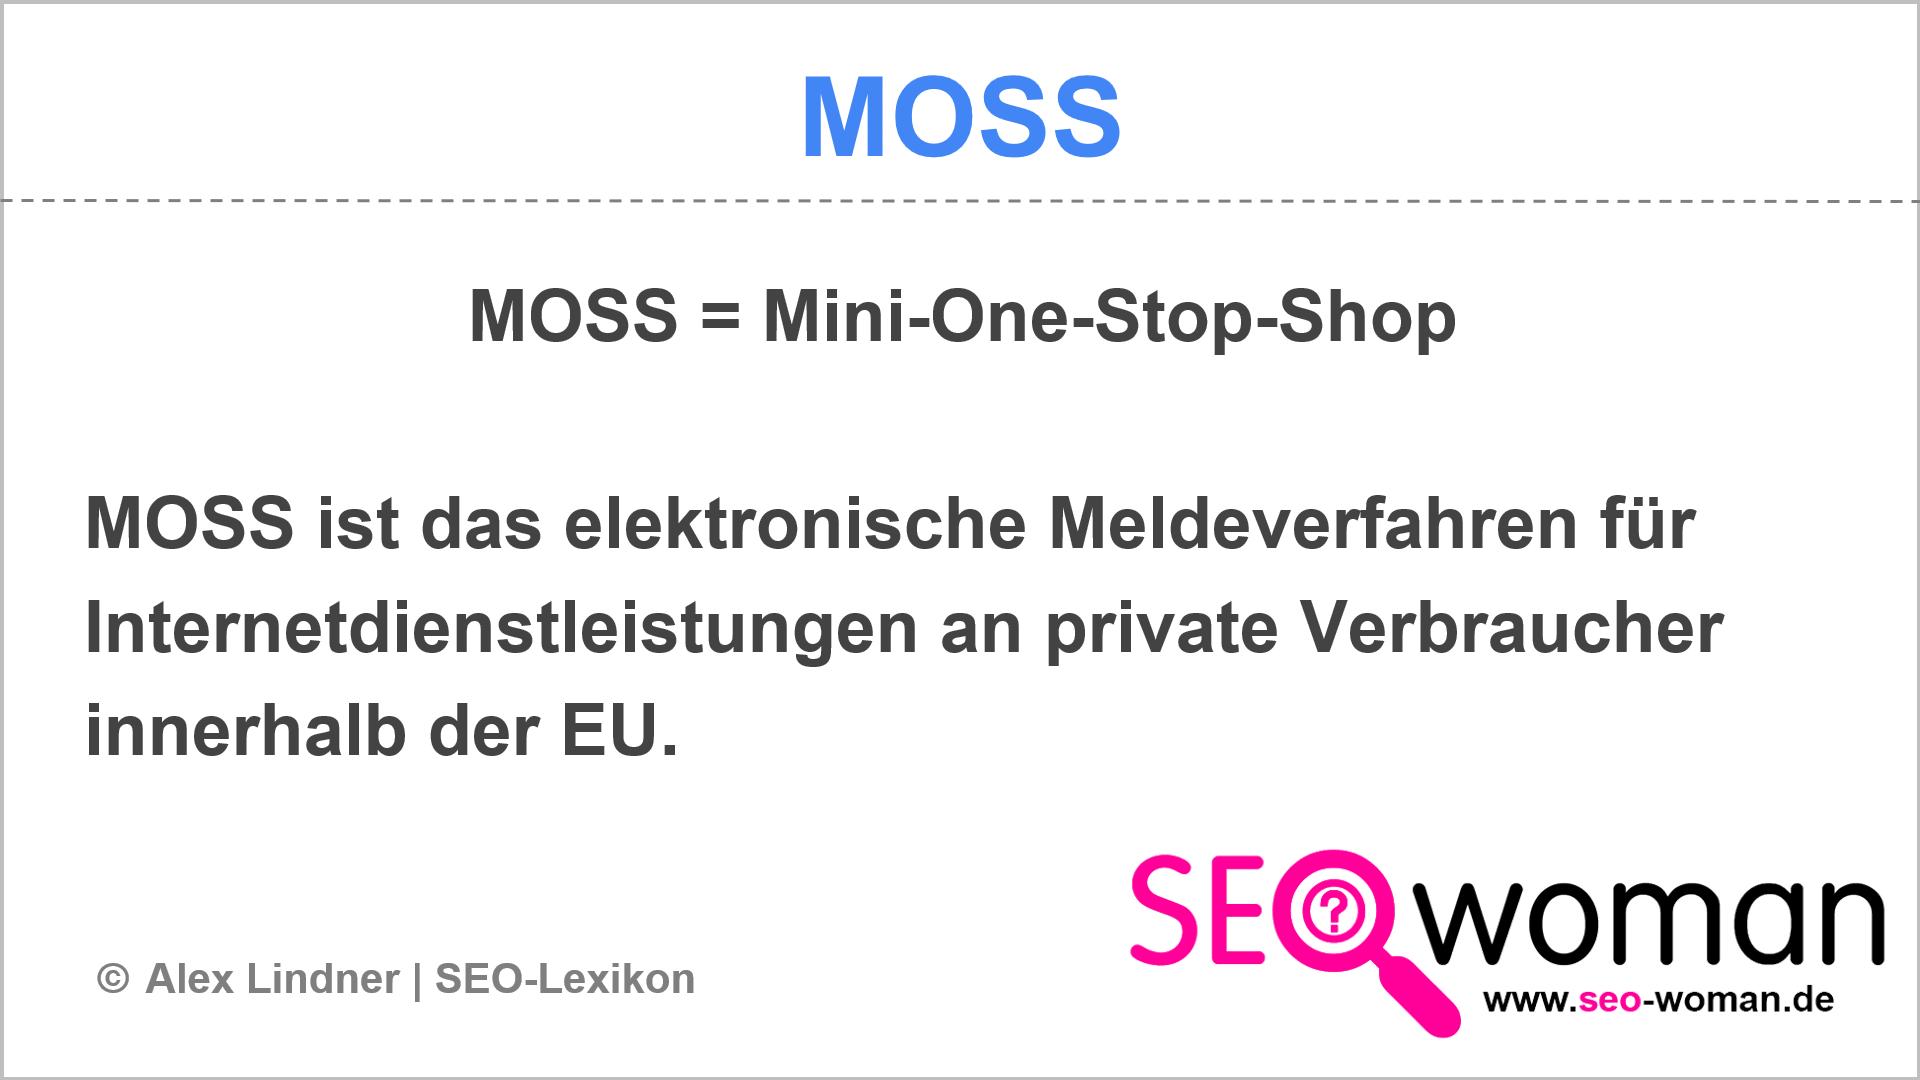 MOSS (Mini-One-Stop-Shop)